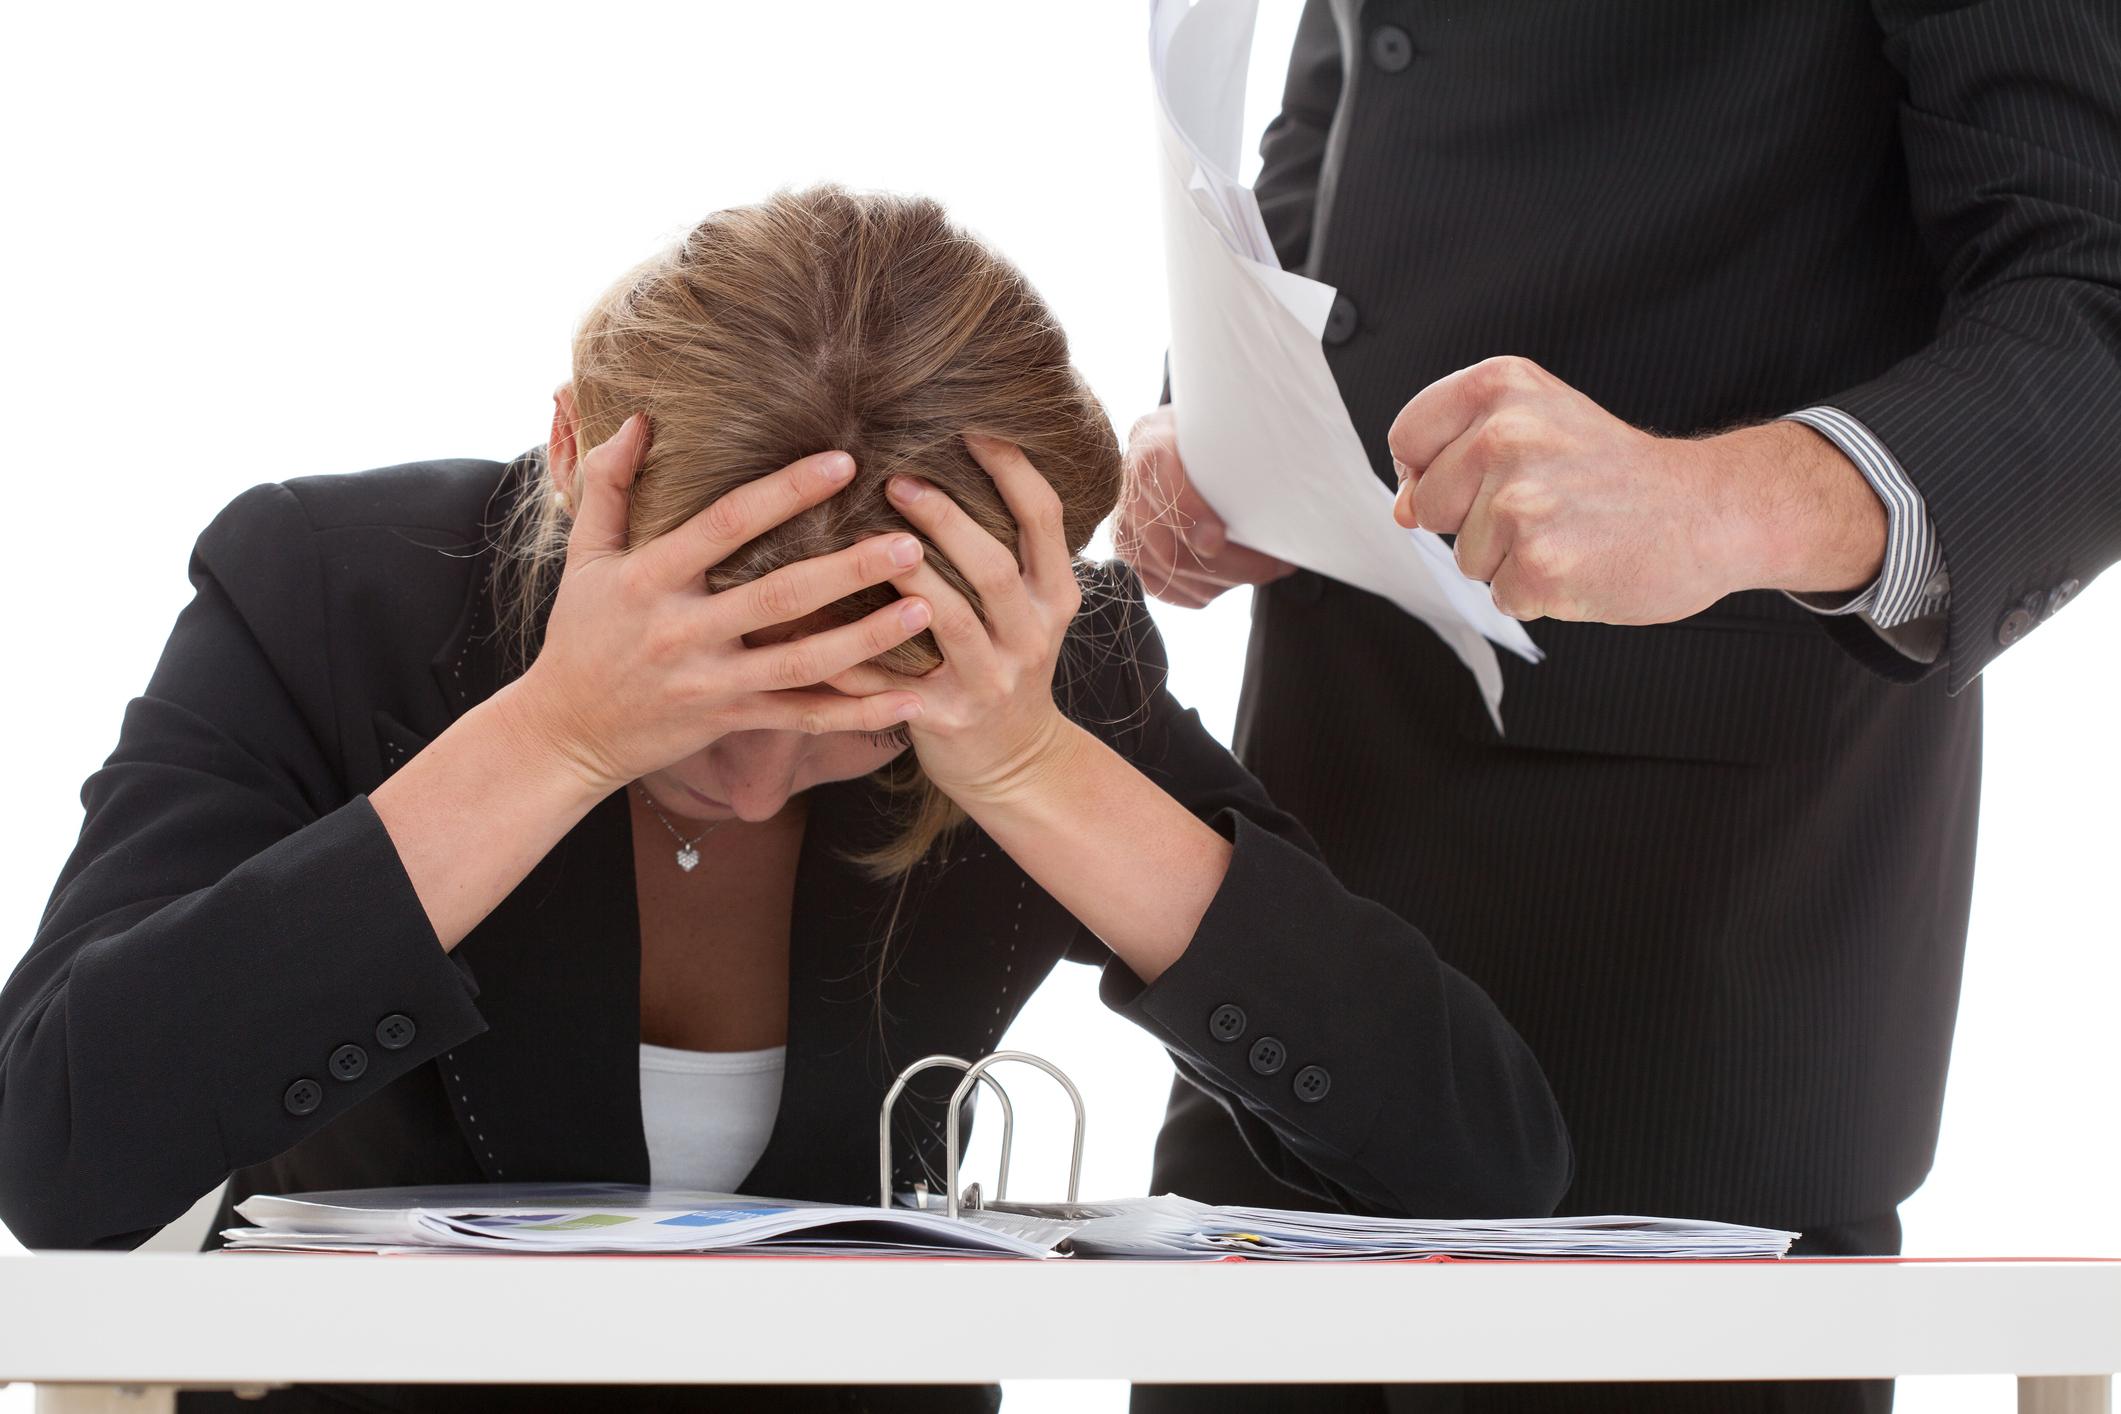 Employee frustrated with demanding boss